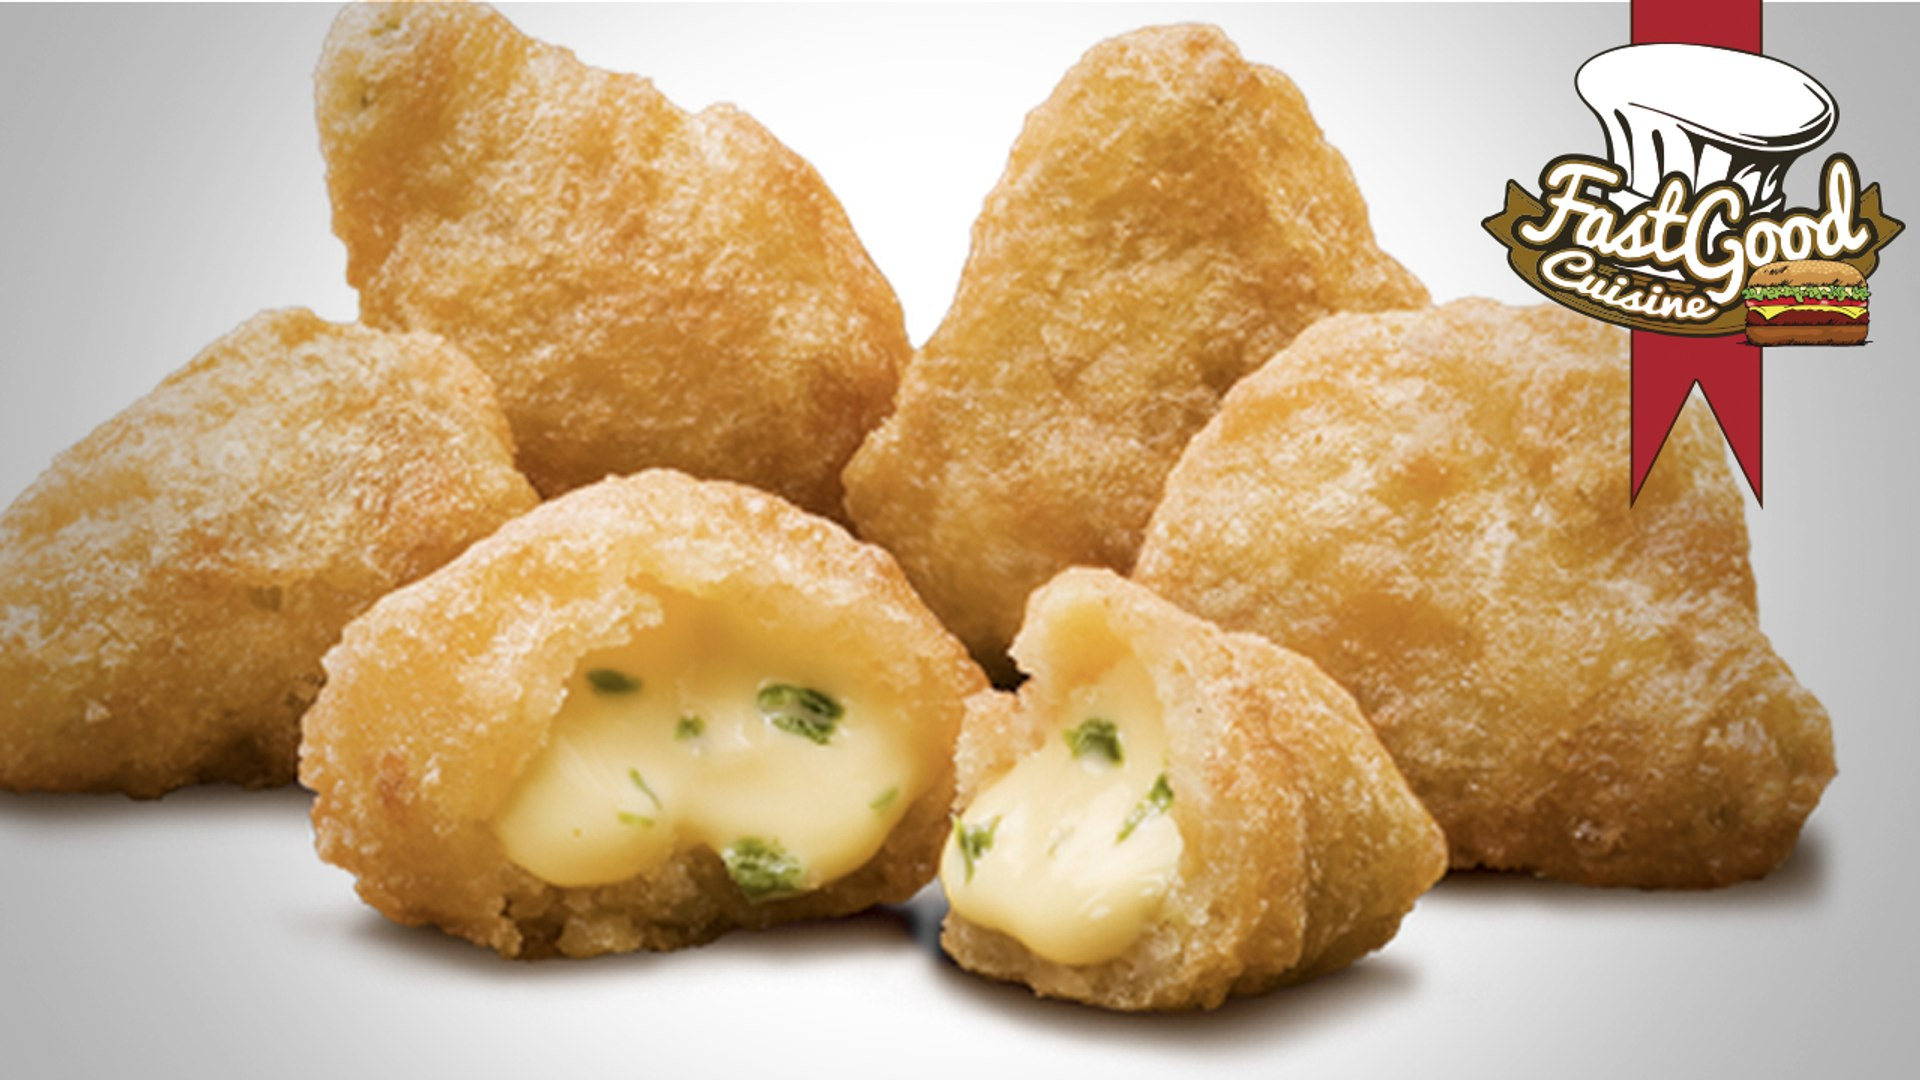 Cheese mcdonalds chili nuggets McDonald's Has